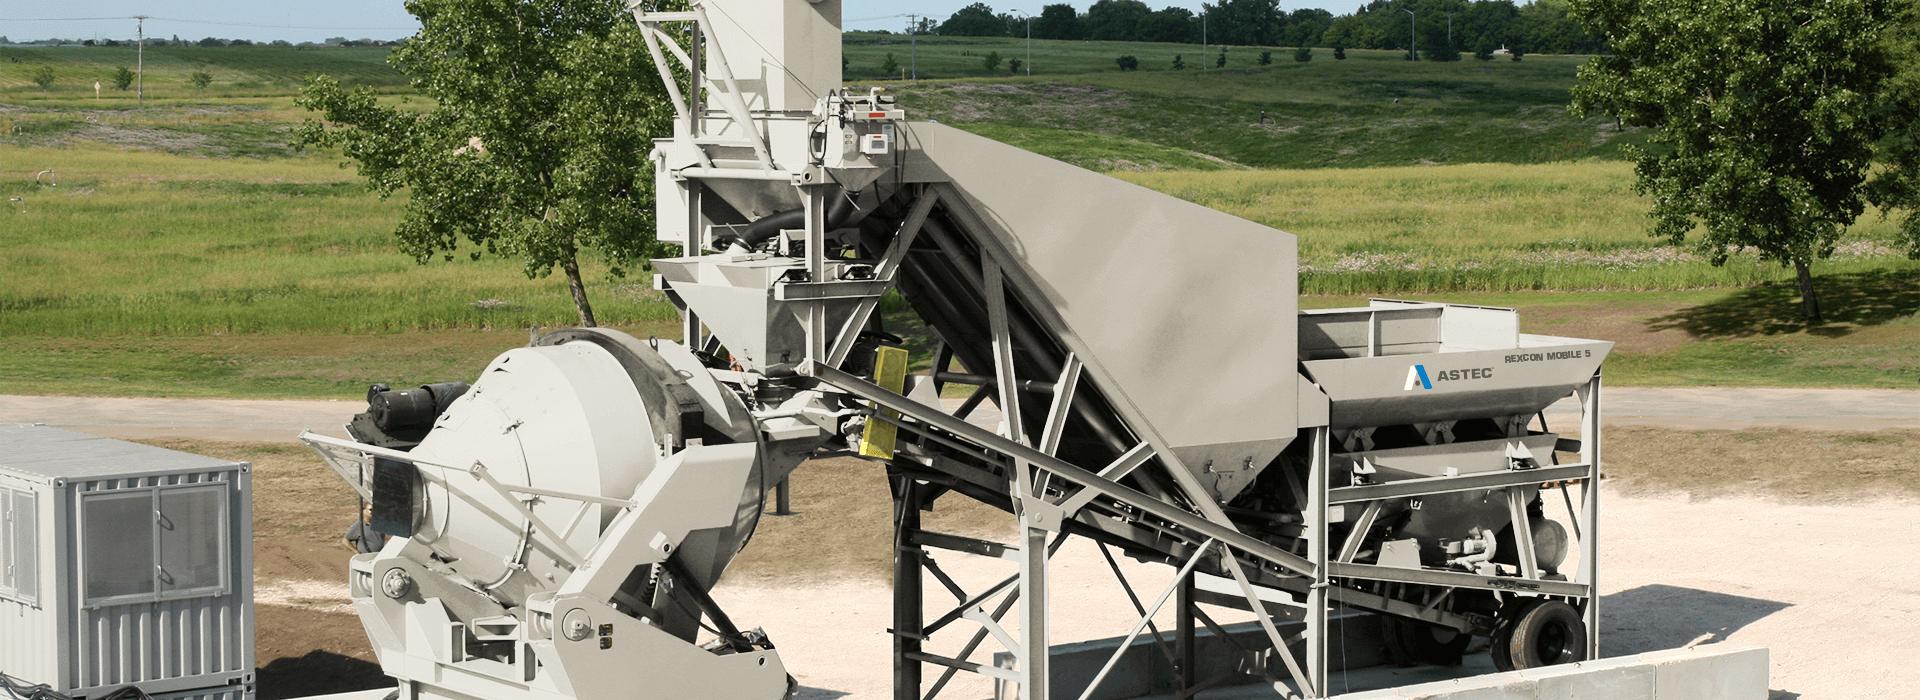 Astec RexCon Mobile 5 Self-Erecting Central Mix Concrete Batch Plant